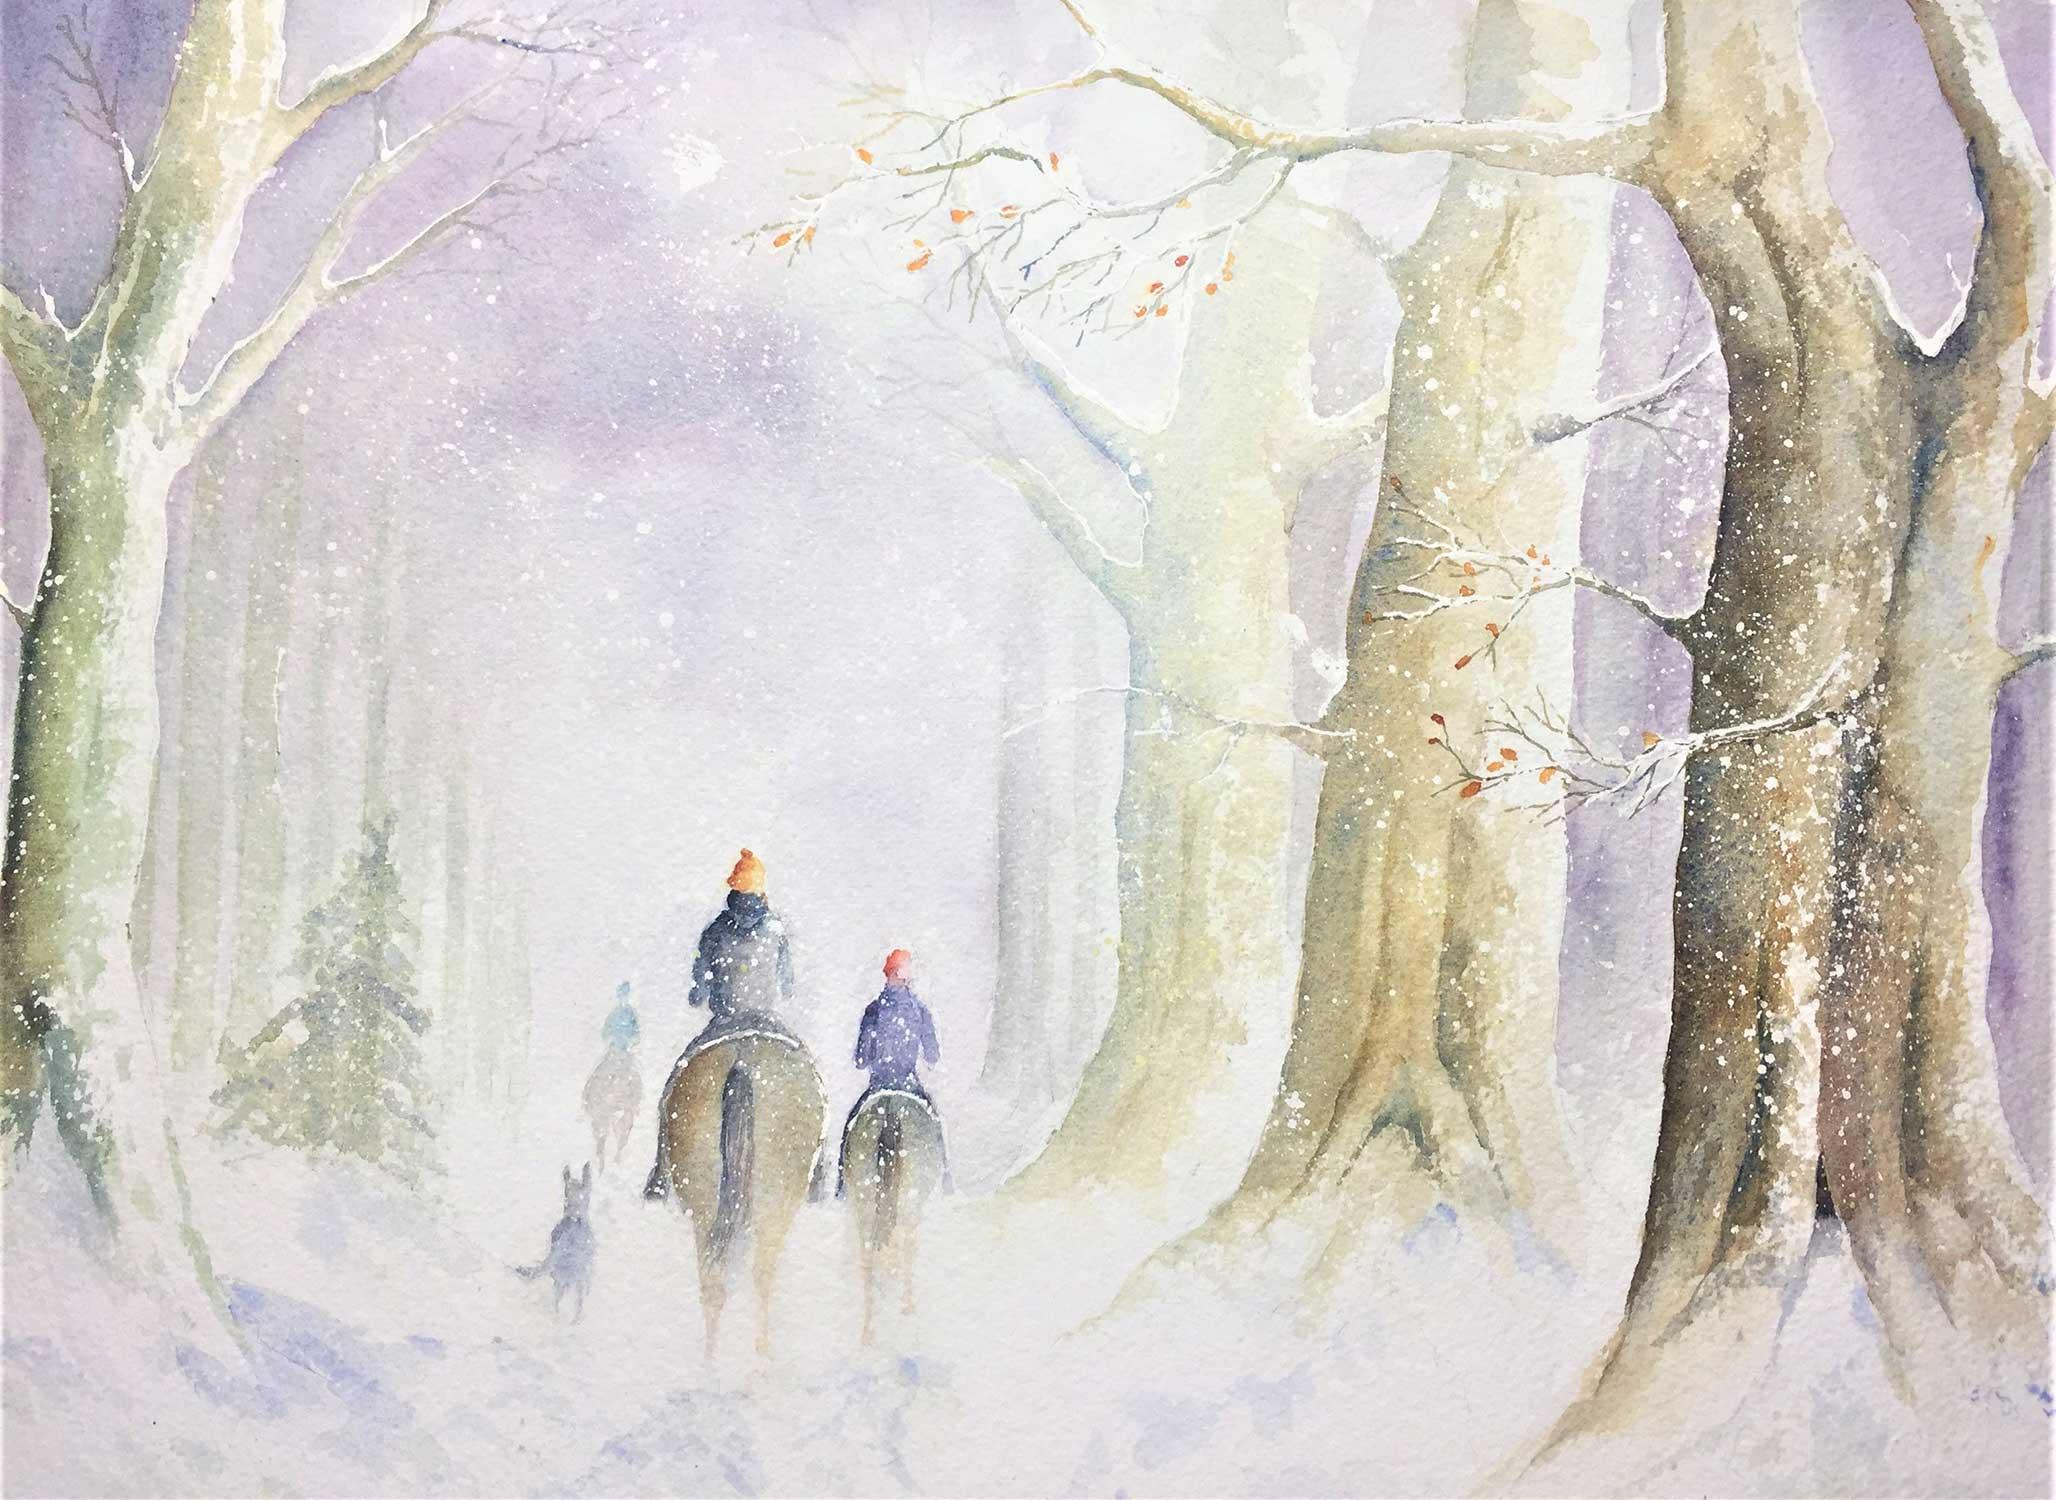 Pferdeduft im Schneewald, Aquarell